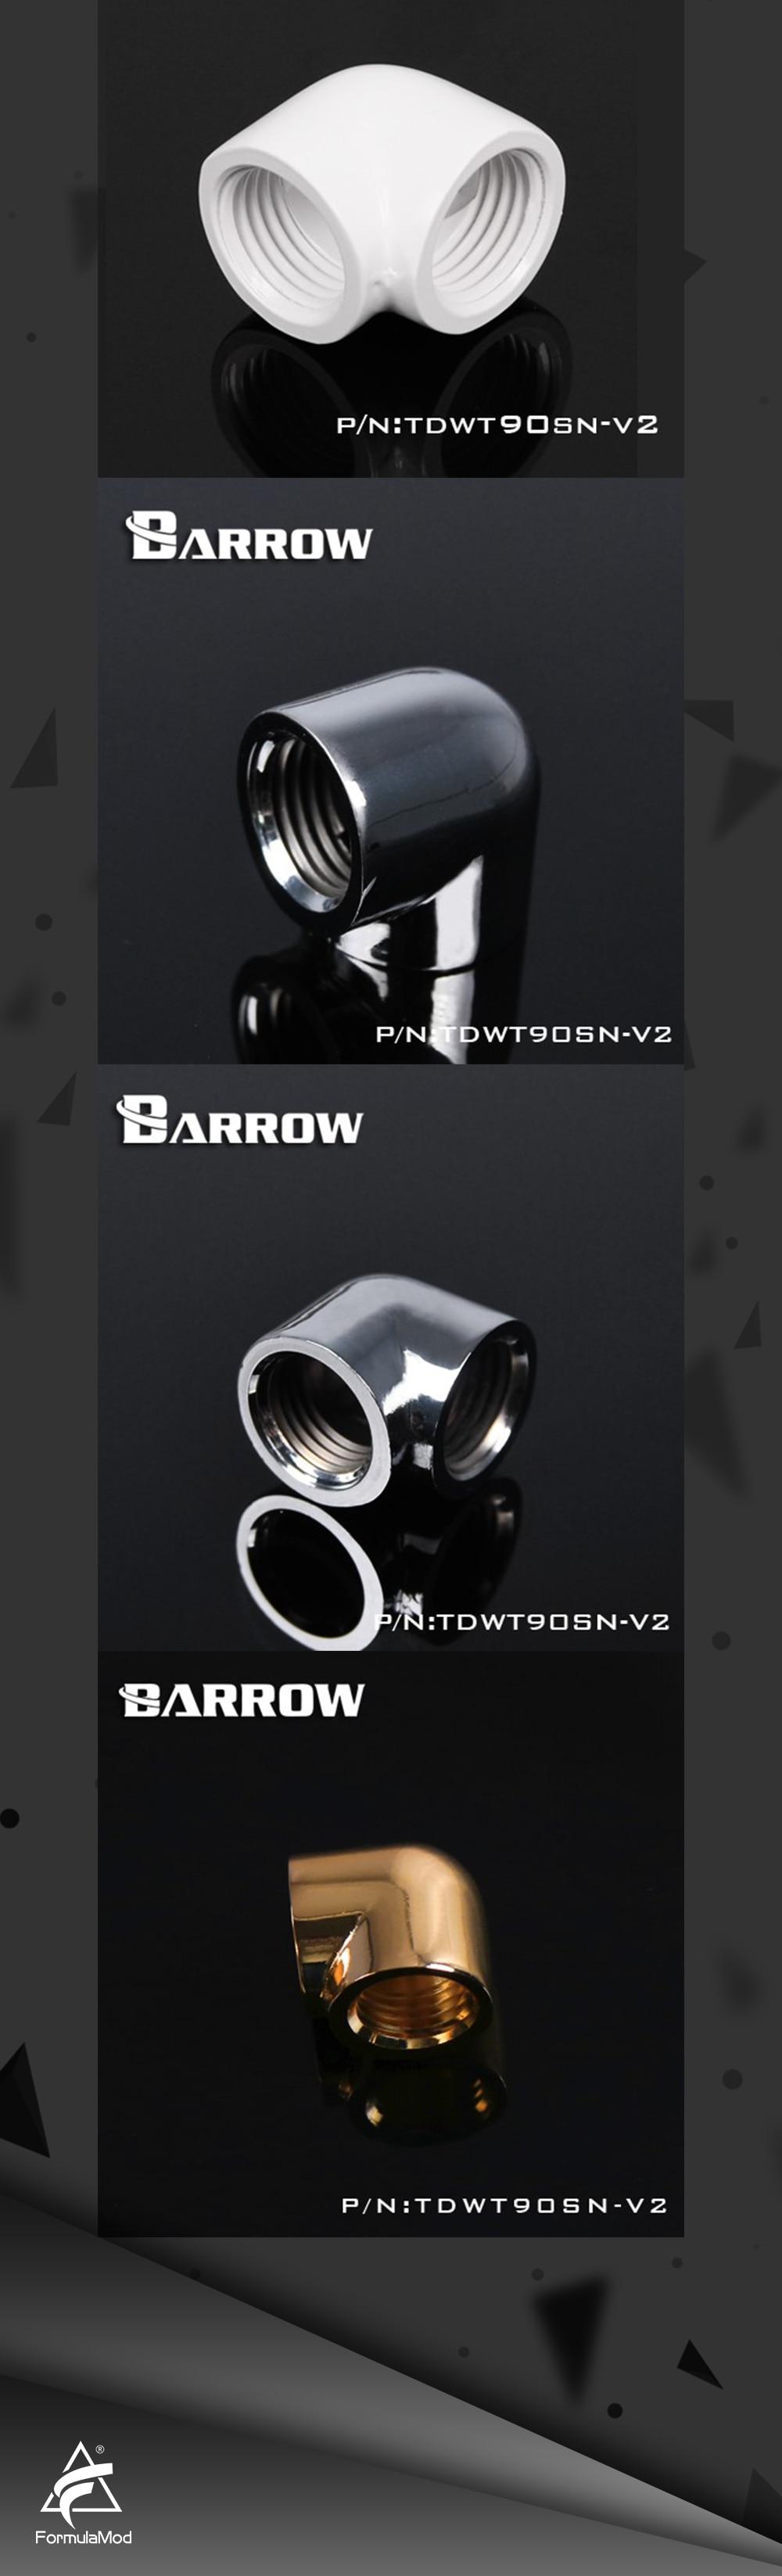 Barrow double internal G1/4'' thread 90 degree Fitting Adapter water cooling Adaptors water cooling fitting TDWT90SN-V2